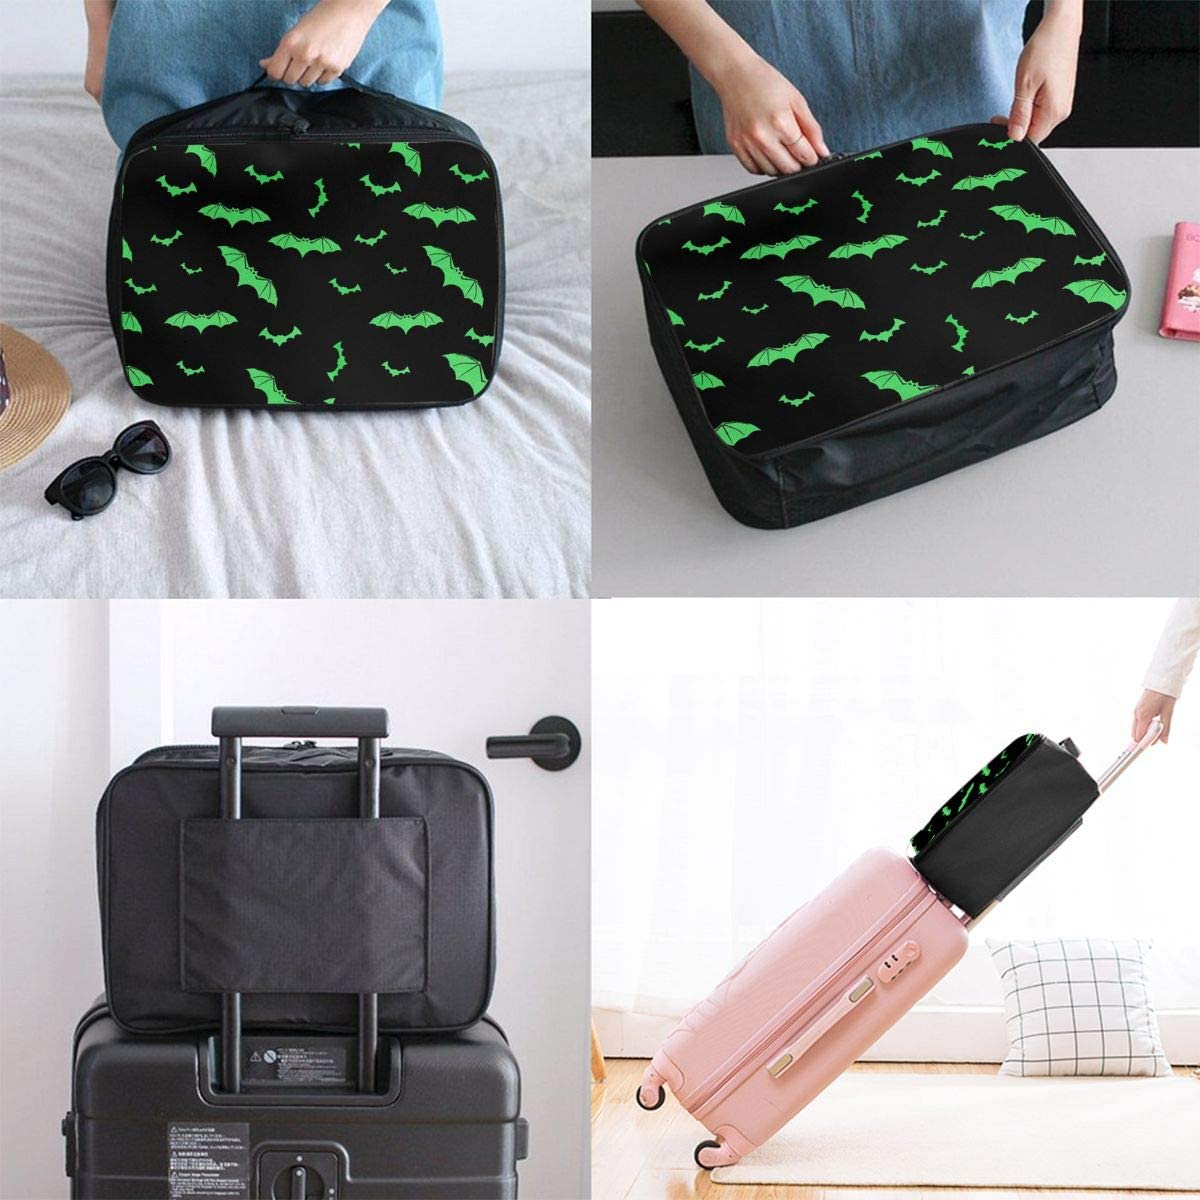 Green Bat Travel Carry-on Luggage Weekender Bag Overnight Tote Flight Duffel In Trolley Handle